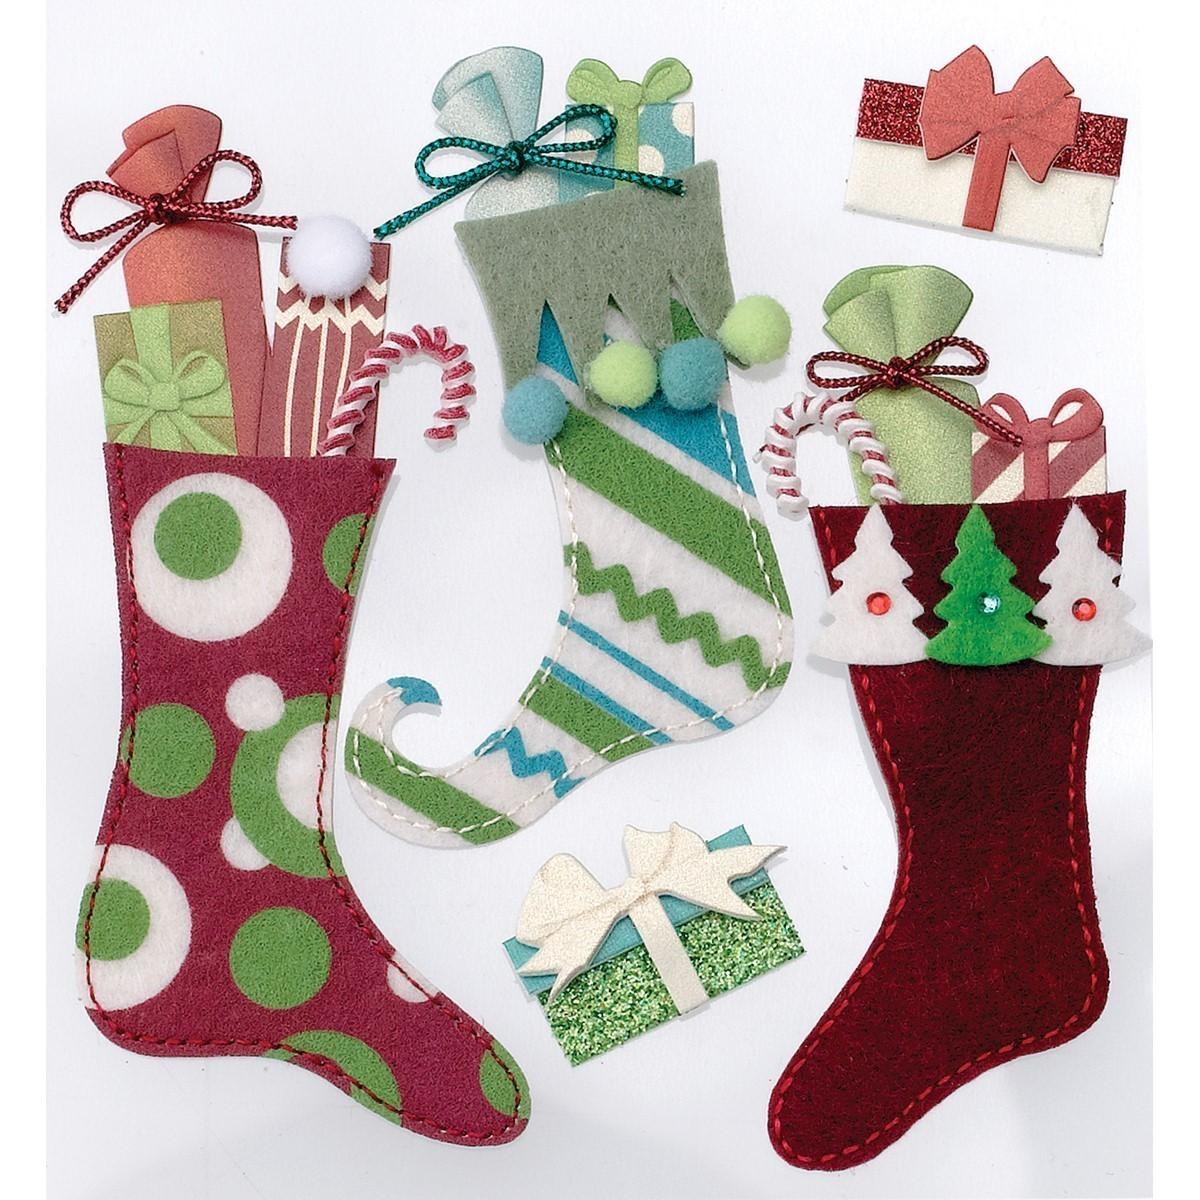 Sew & Stuff Stockings